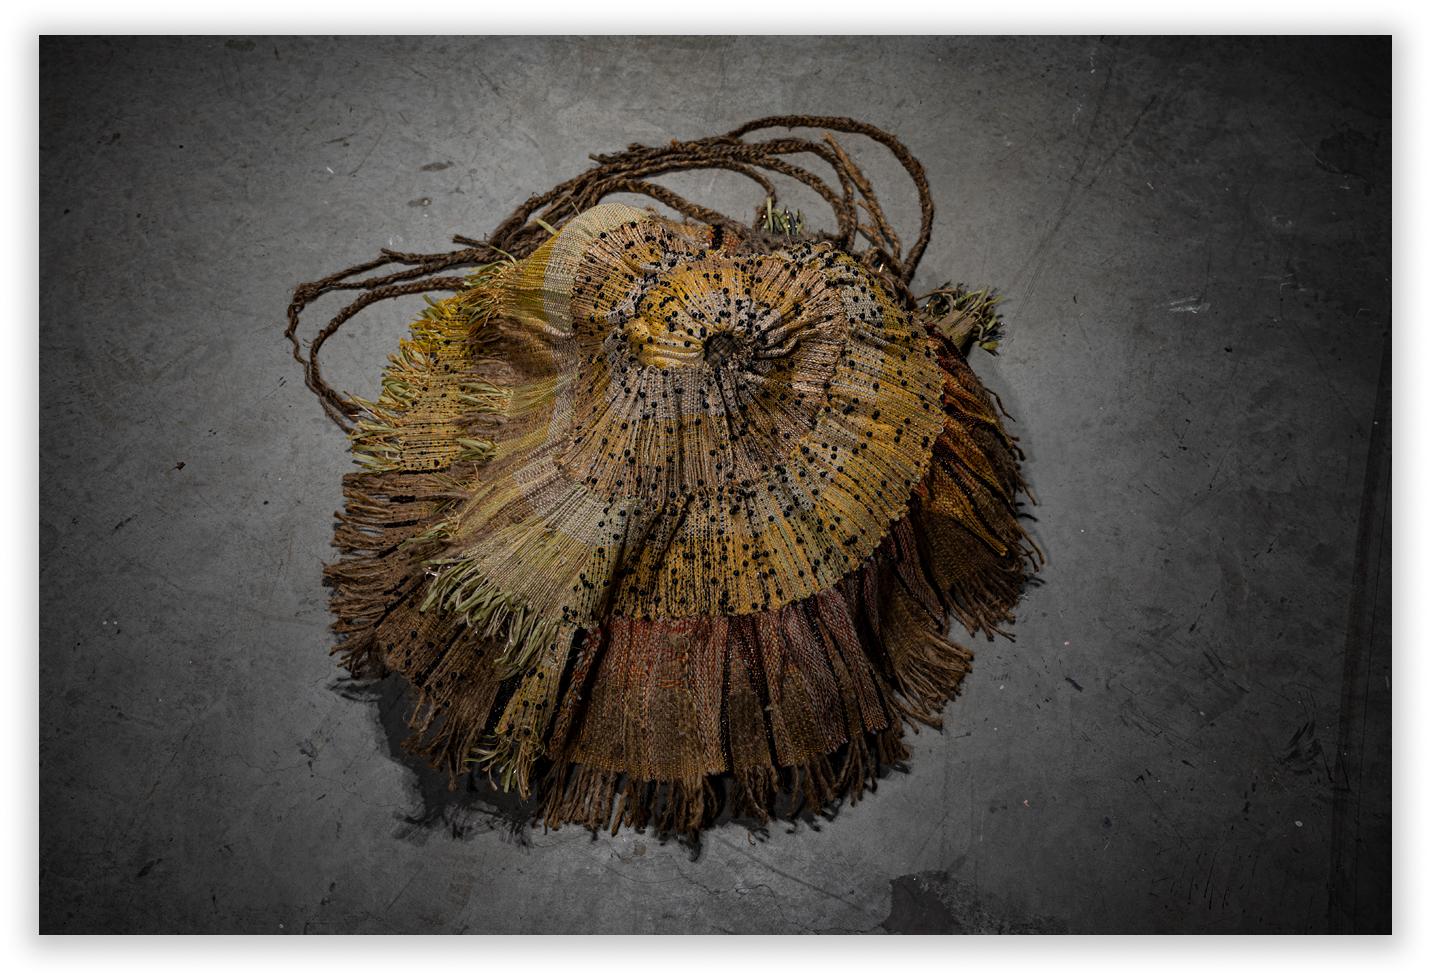 Galdona Broche_Amalia_Flowers for the Saints I (6)with-effect